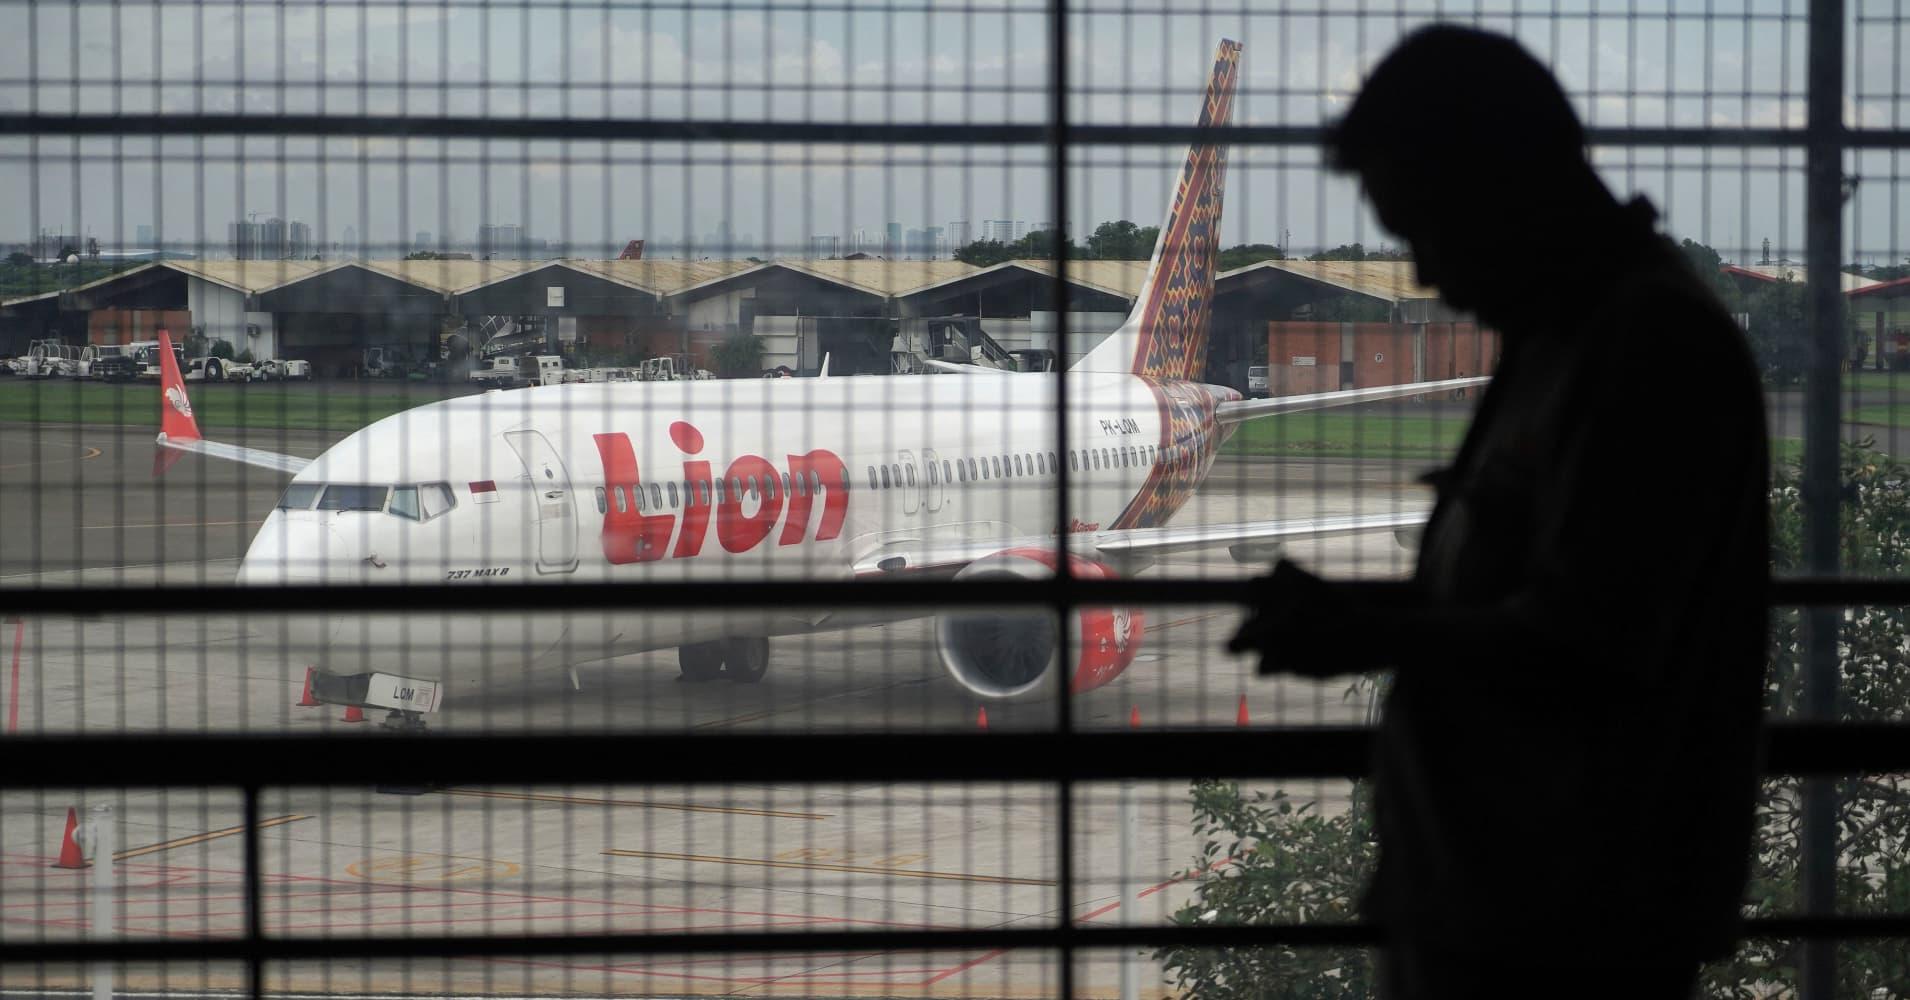 Boeing lost $26.6 billion in market value since Sunday's 737 Max 8 crash